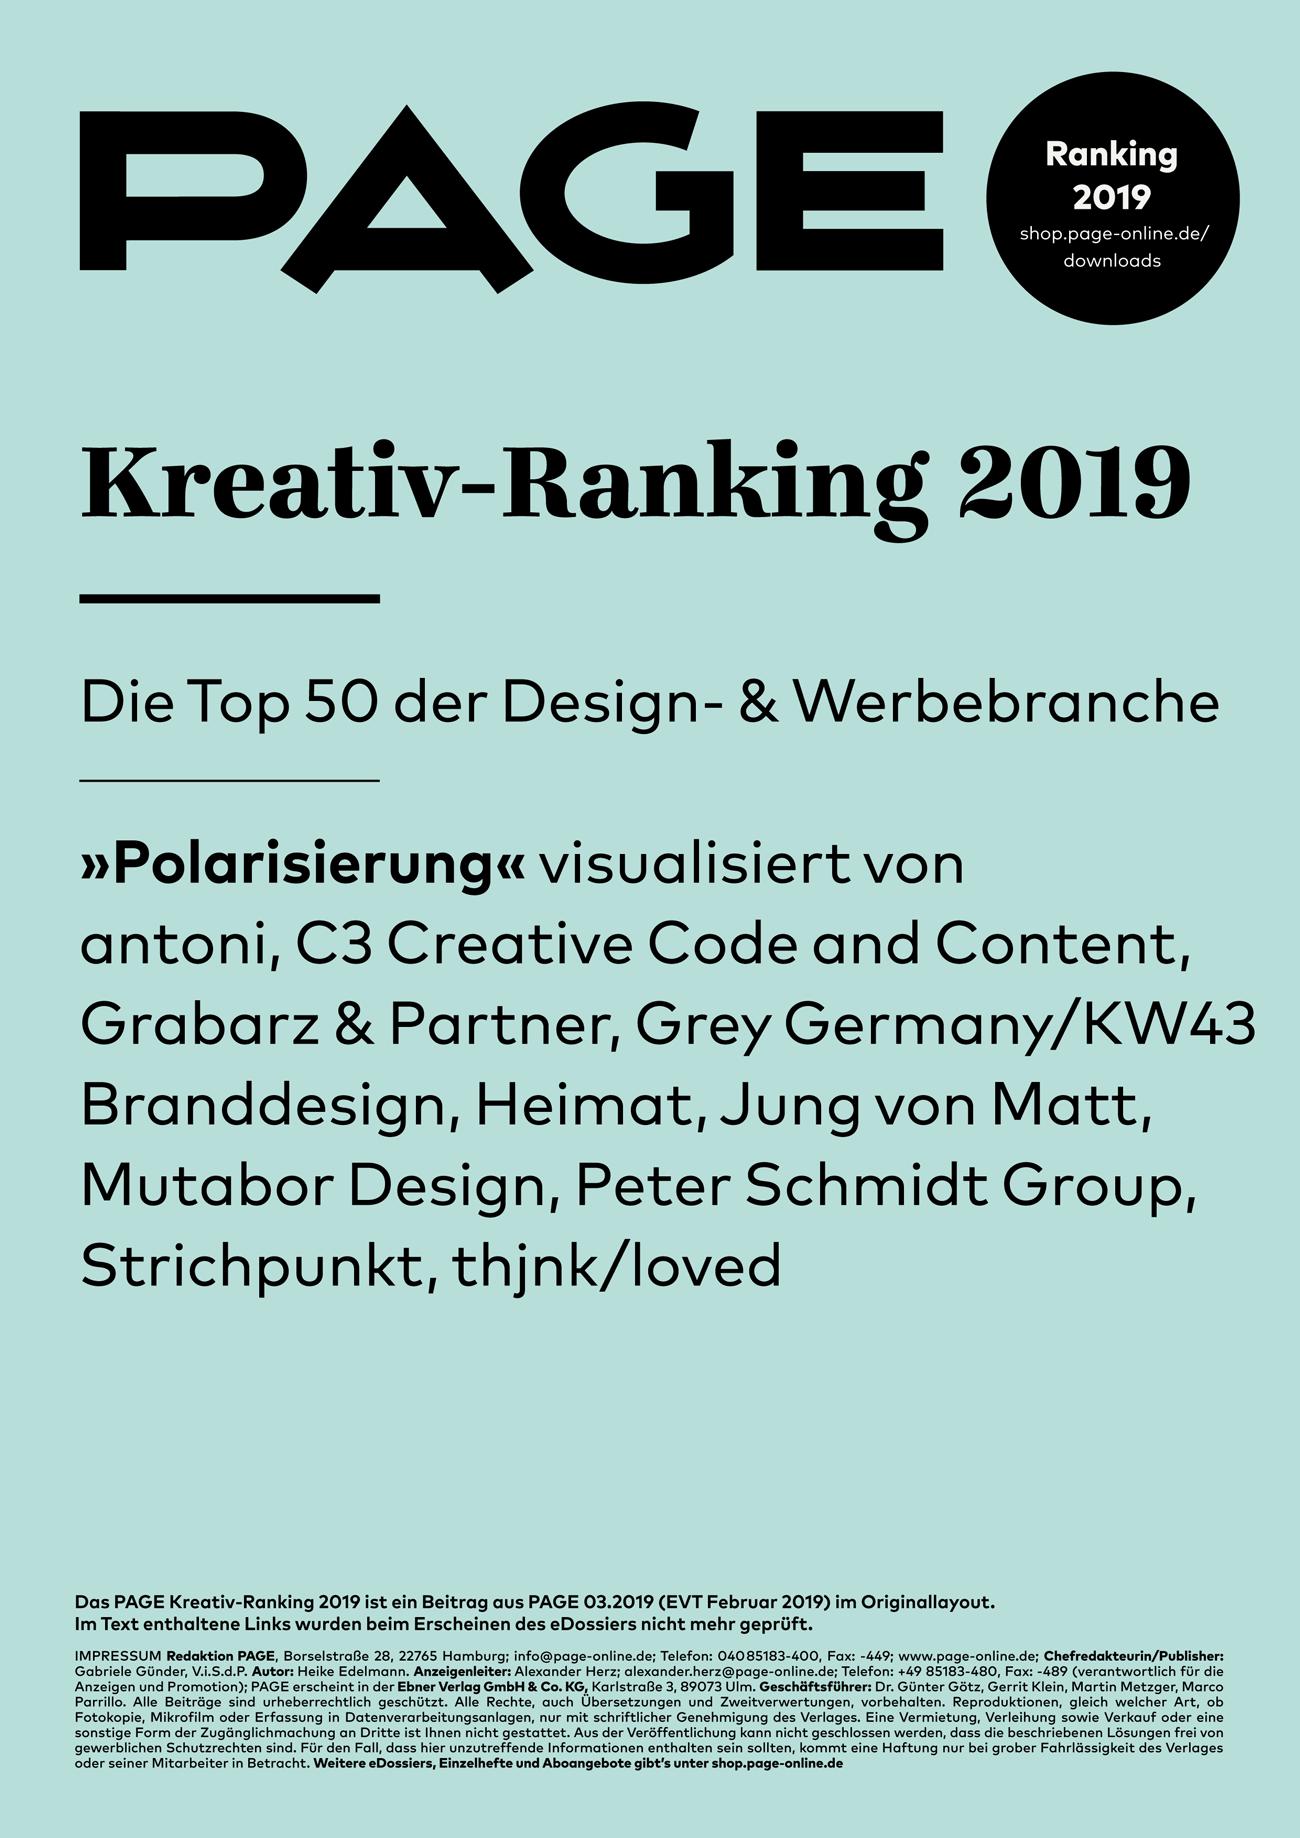 PAGE Kreativ-Ranking 2019